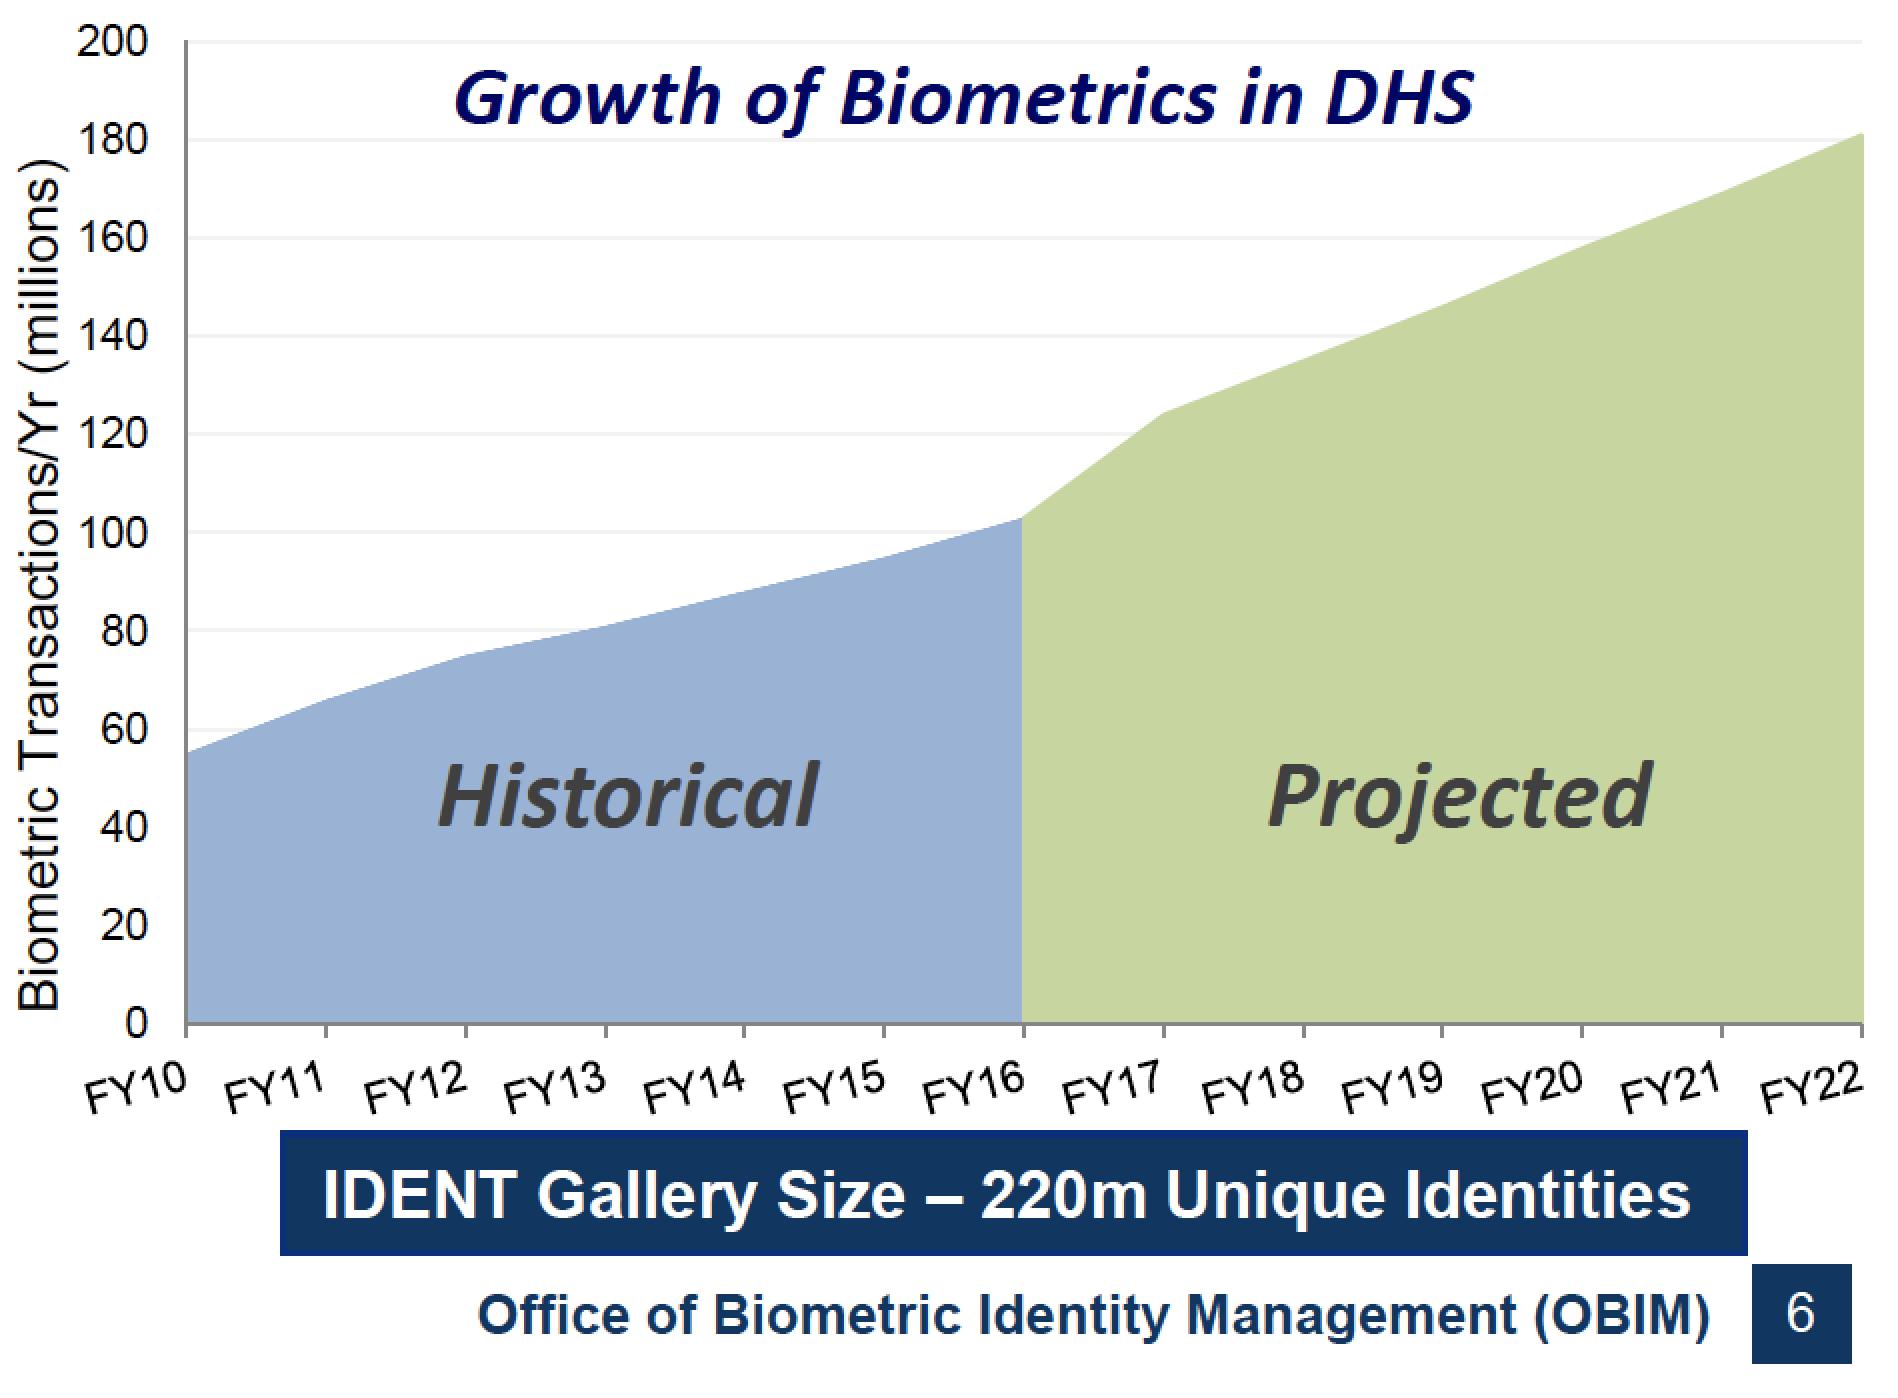 DHS Growth of Biometrics